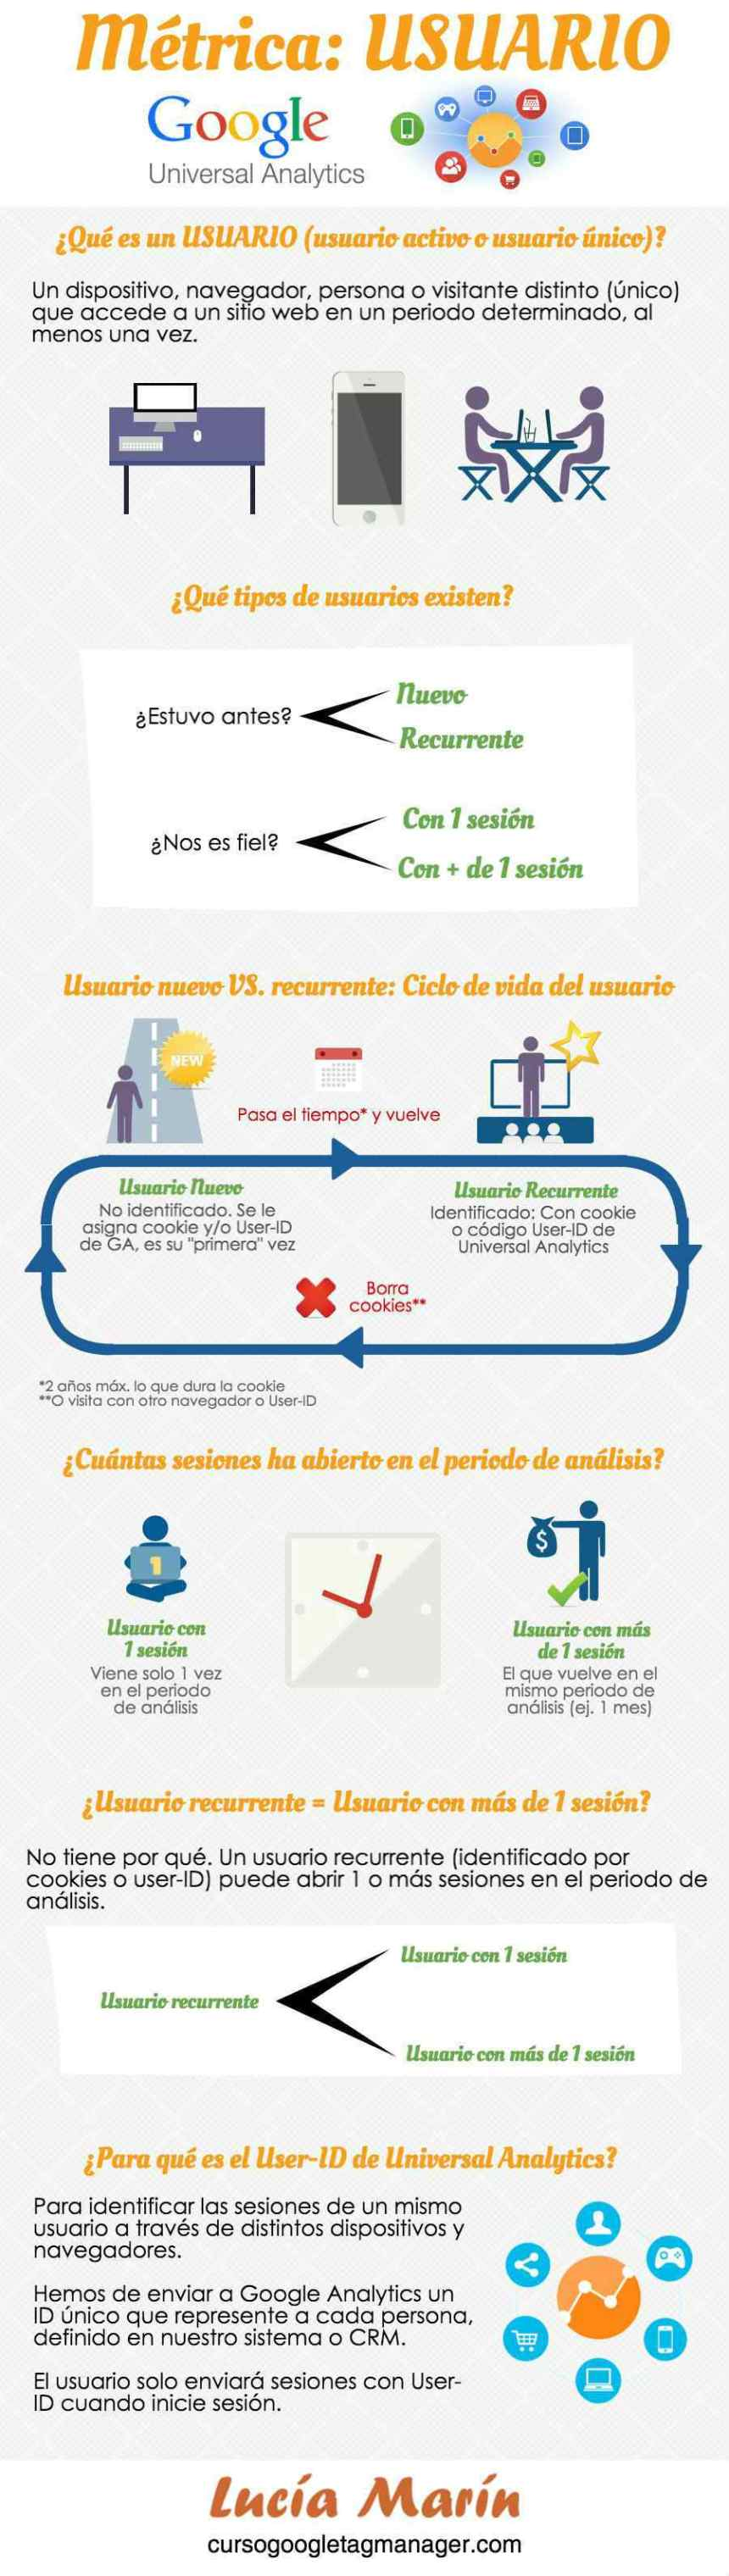 Métrica usuario en Google Analytics